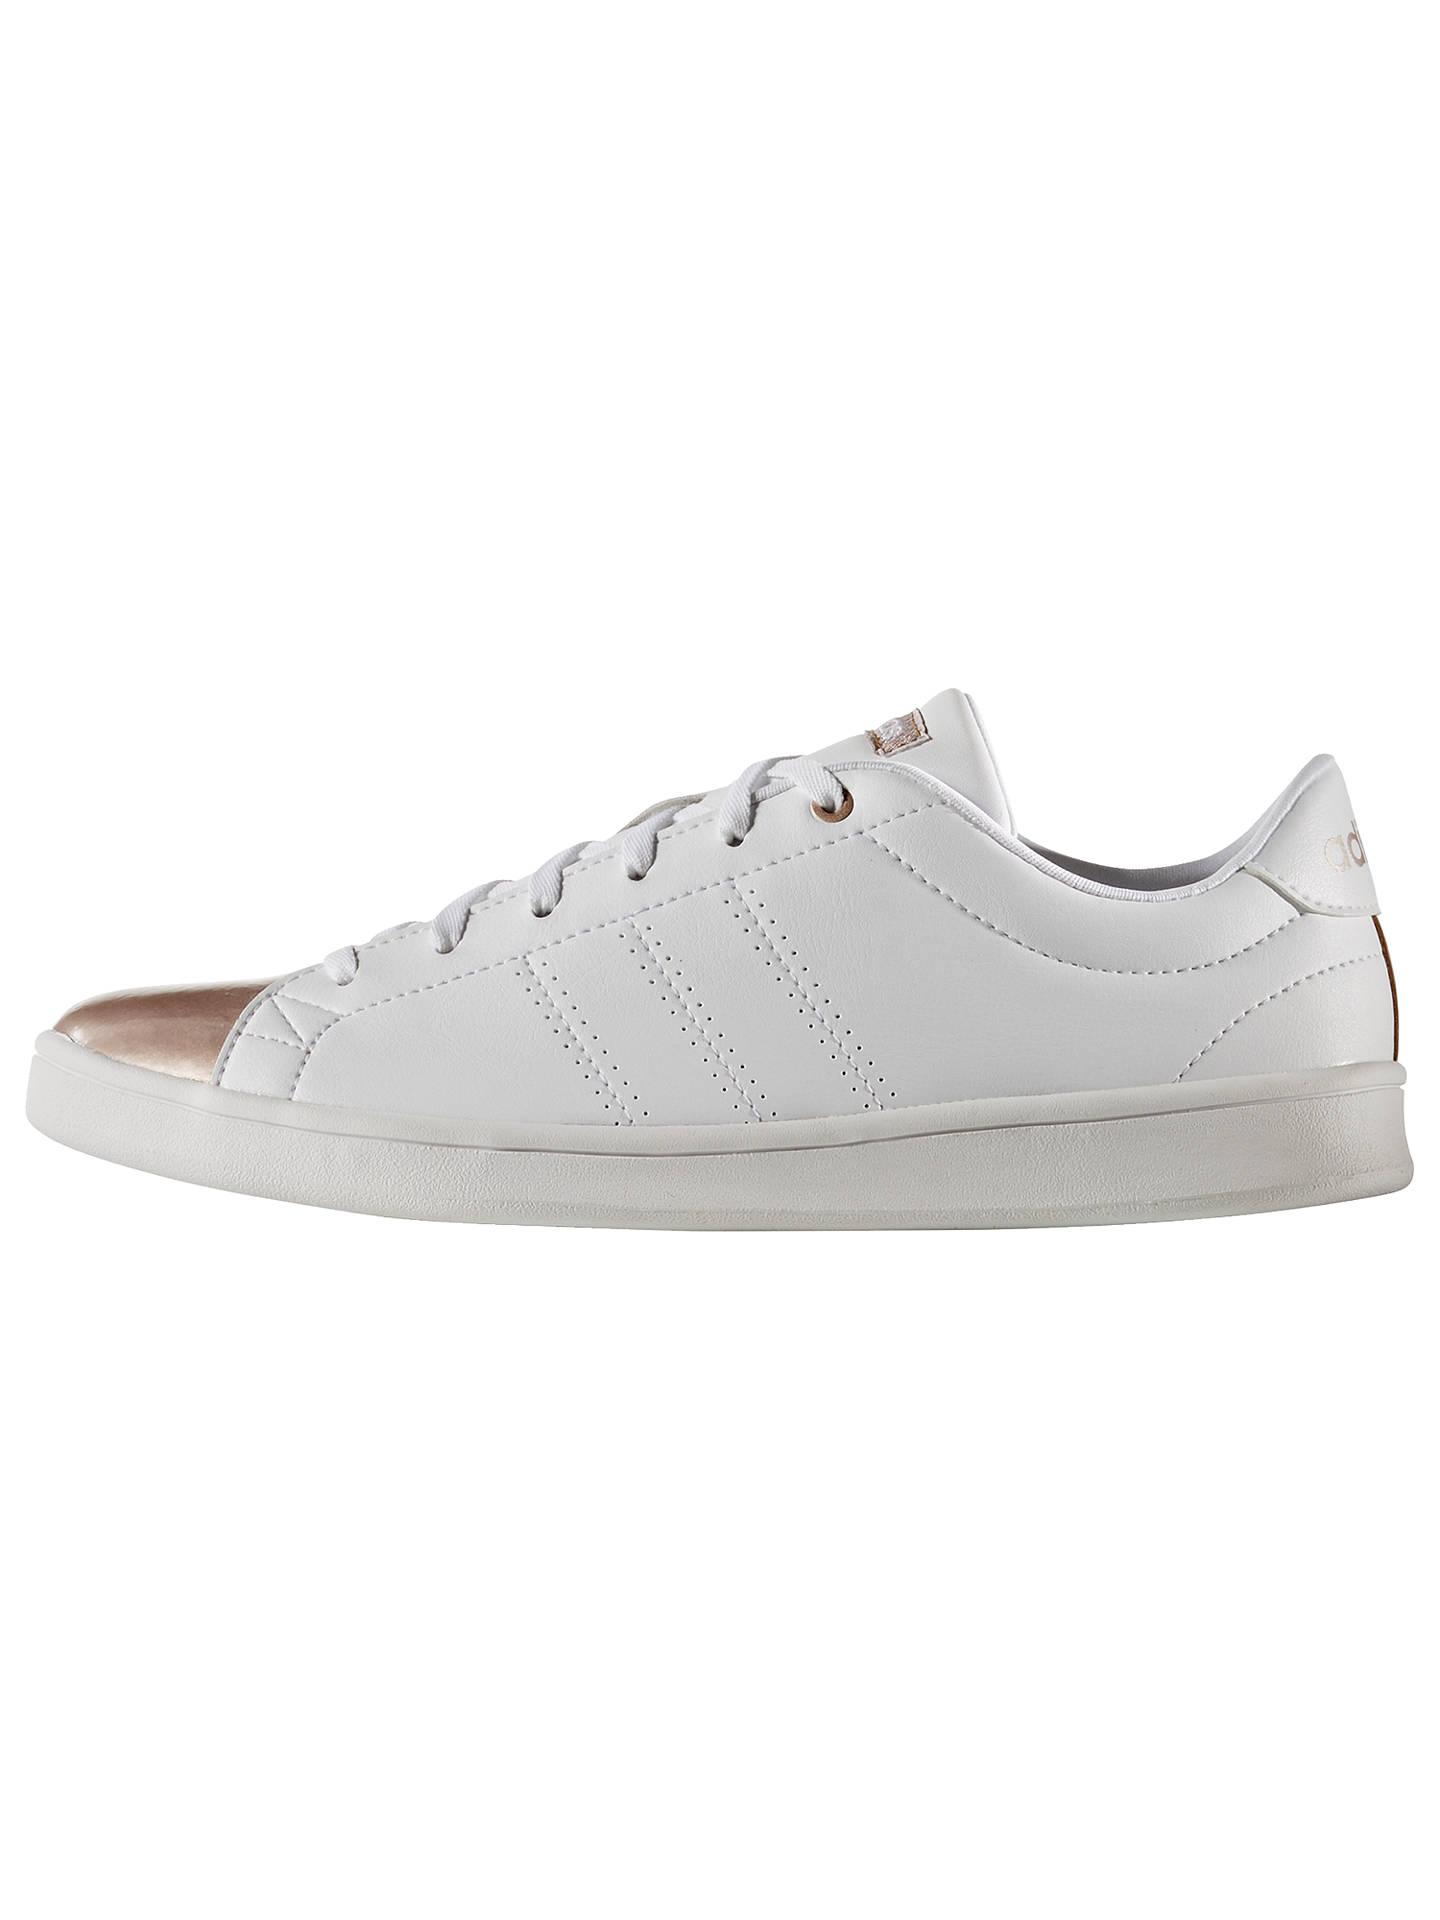 Adidas Neo Advantage Clean Qt White Black Women Casual